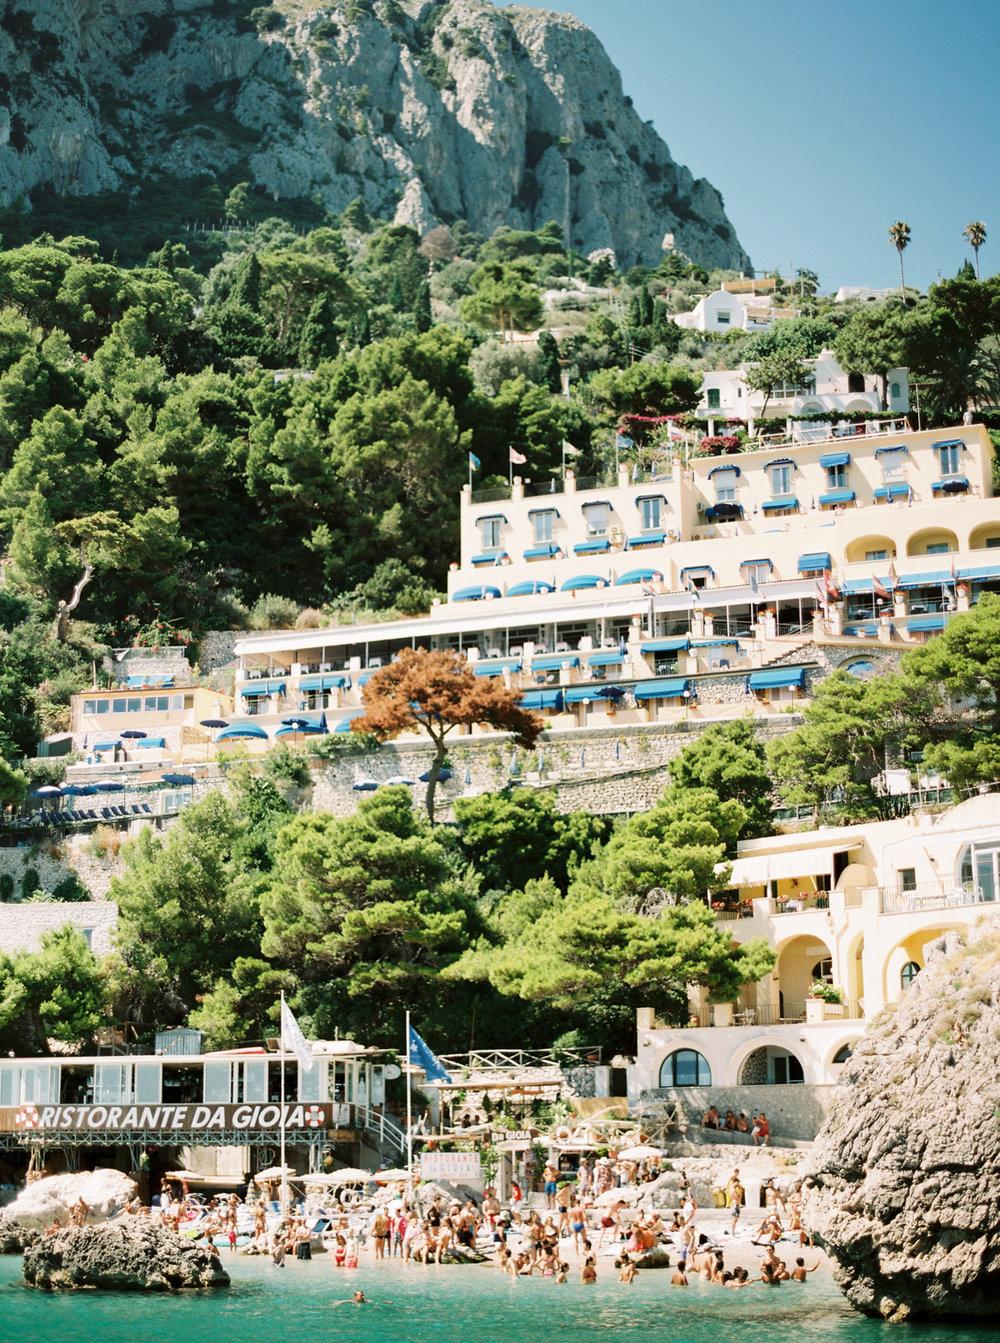 Erich-Mcvey-Capri-Coco-Lane.jpg-4 copy.jpg